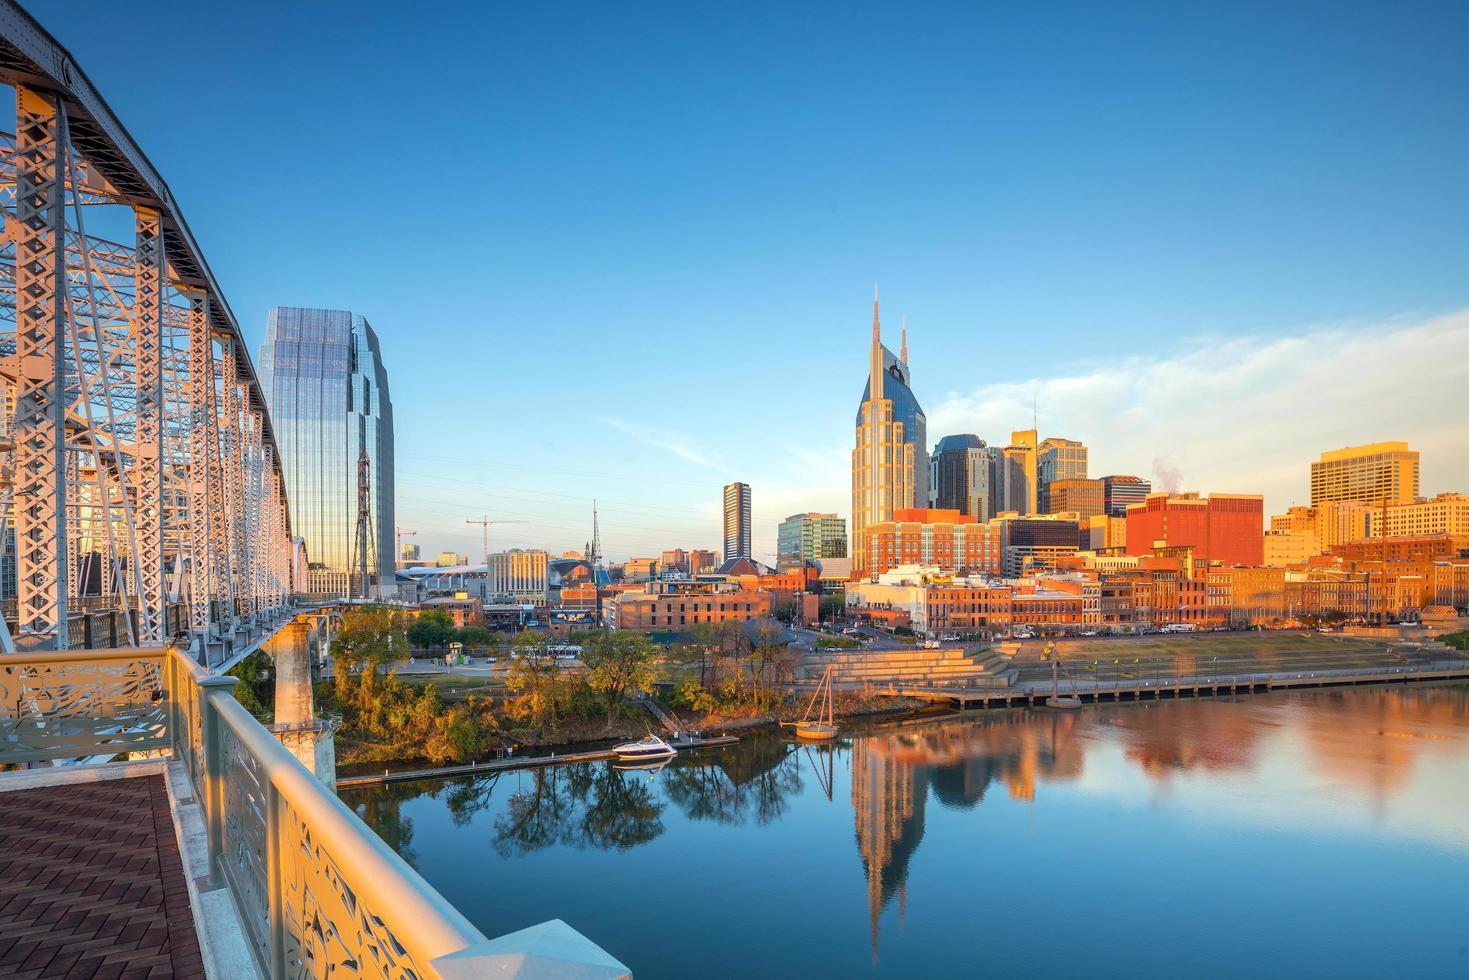 Nashville Tennessee skyline van het centrum foto